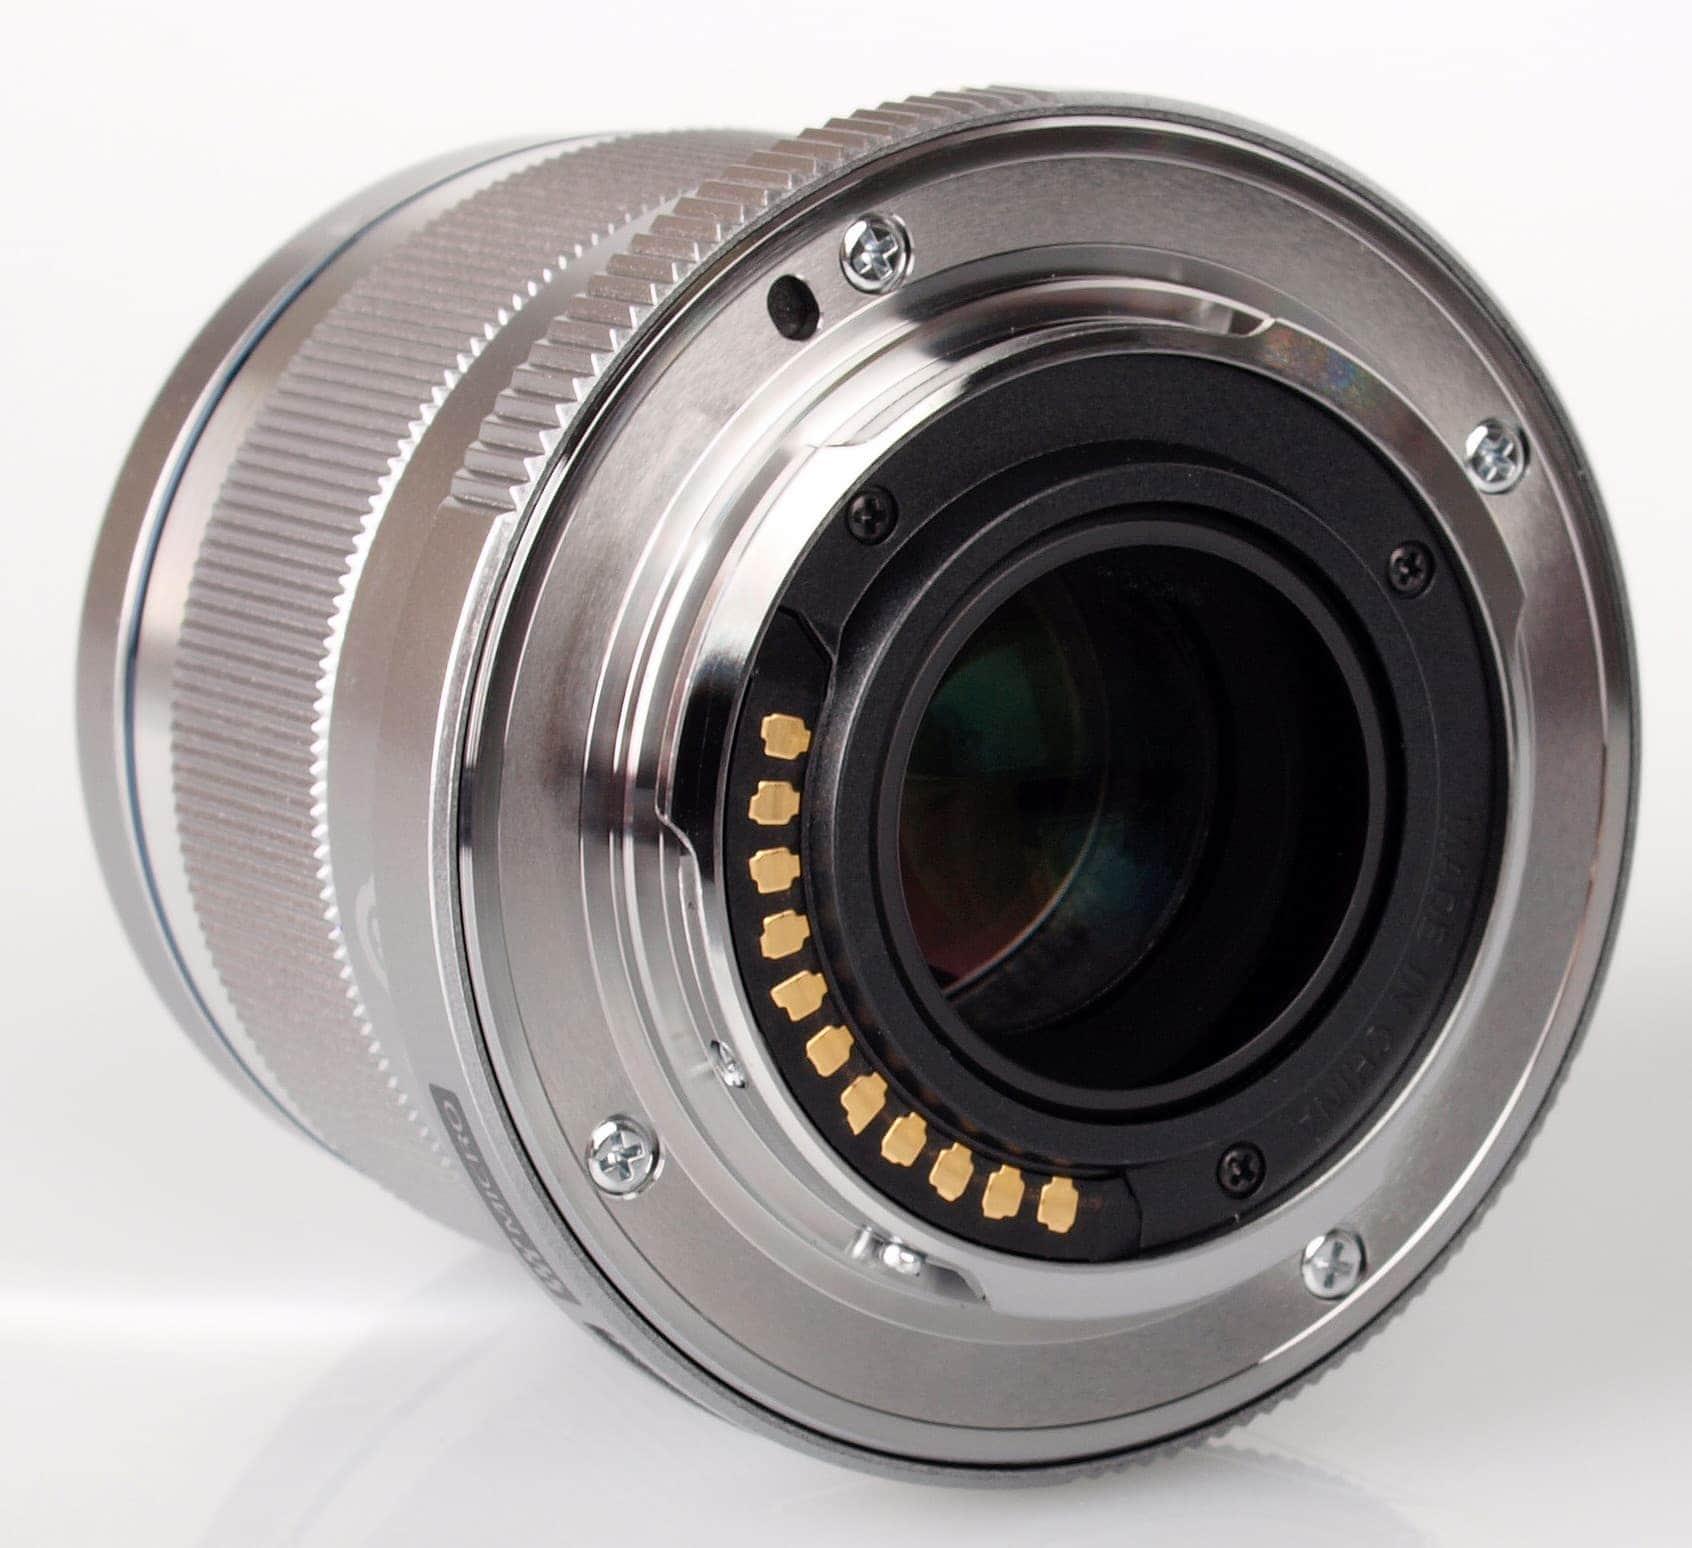 Olympus M.Zuiko Objetivo Digital Angular 12mm f/2.0 Plata (Metálico)